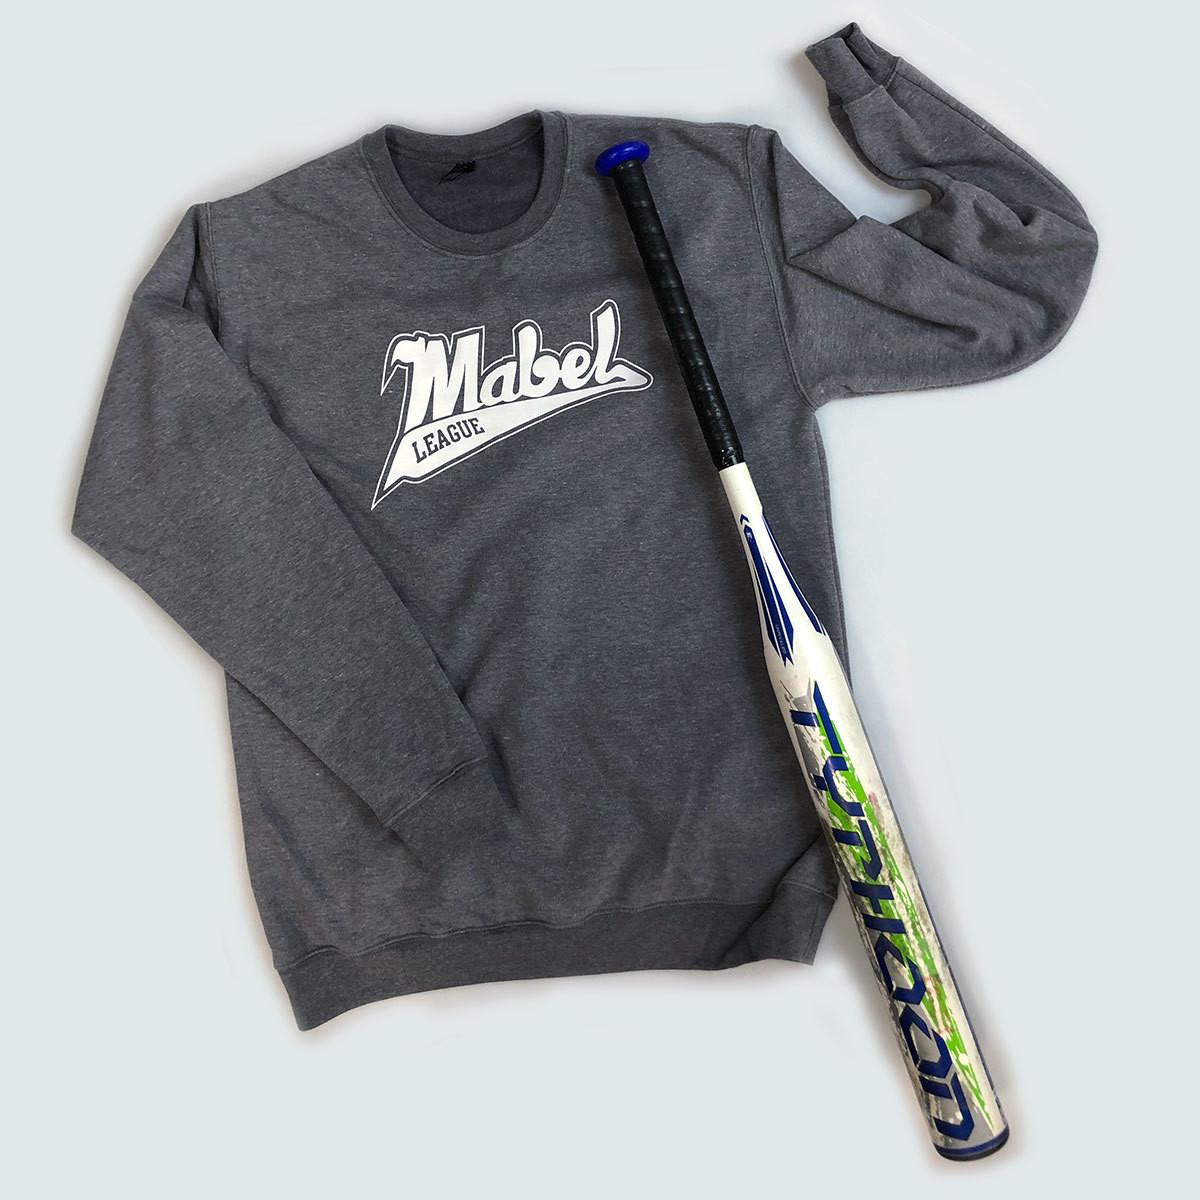 Mabel Crewneck Pullover Sweatshirt